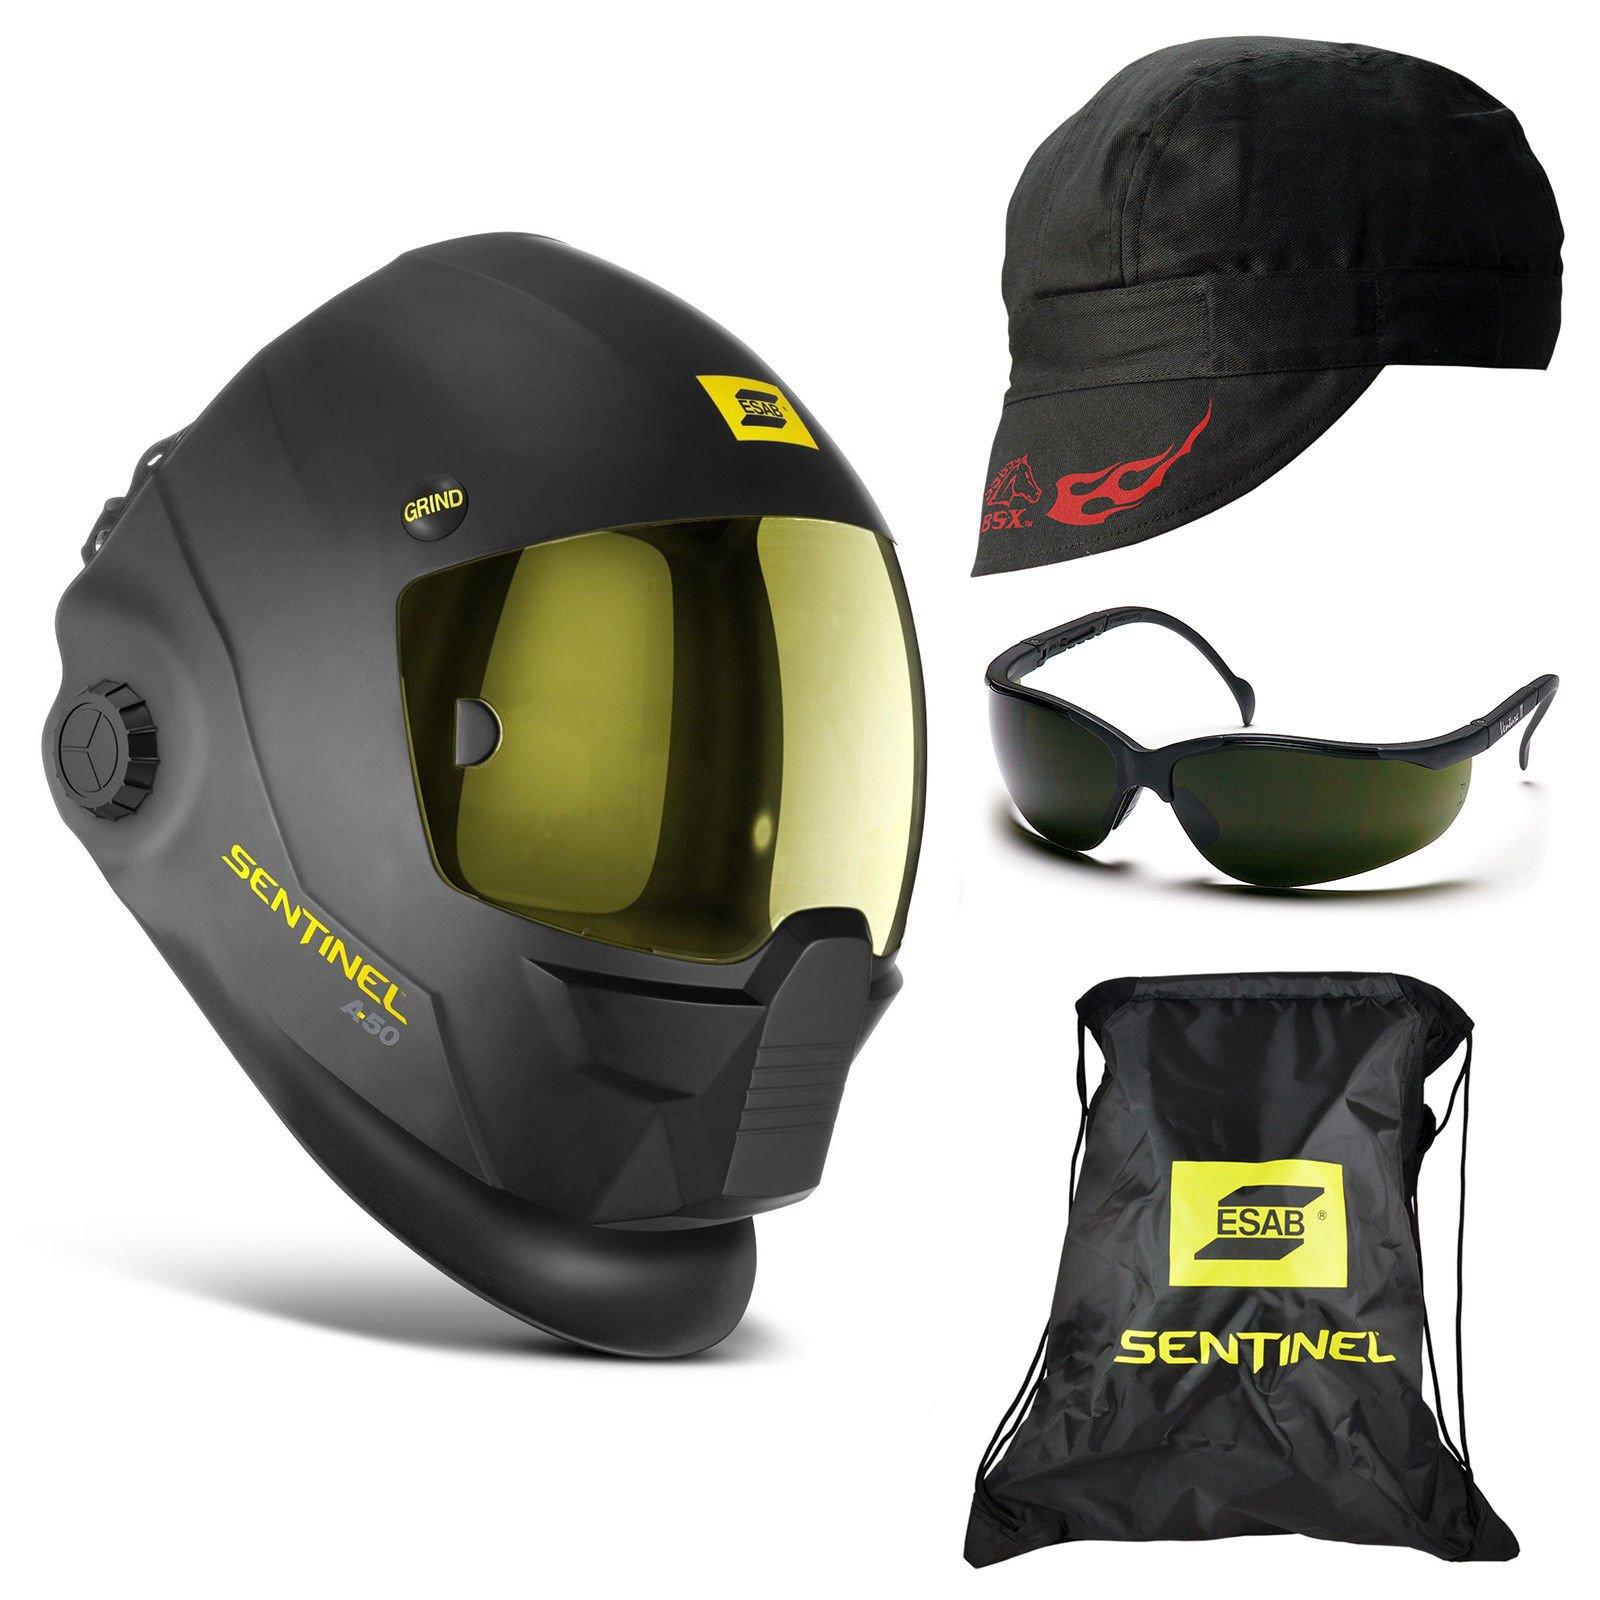 ESAB Sentinel A50 Automatic Welding Helmet, 5.0 Glasses, Revco Cap (BC5W-BK) by ESAB (Image #1)